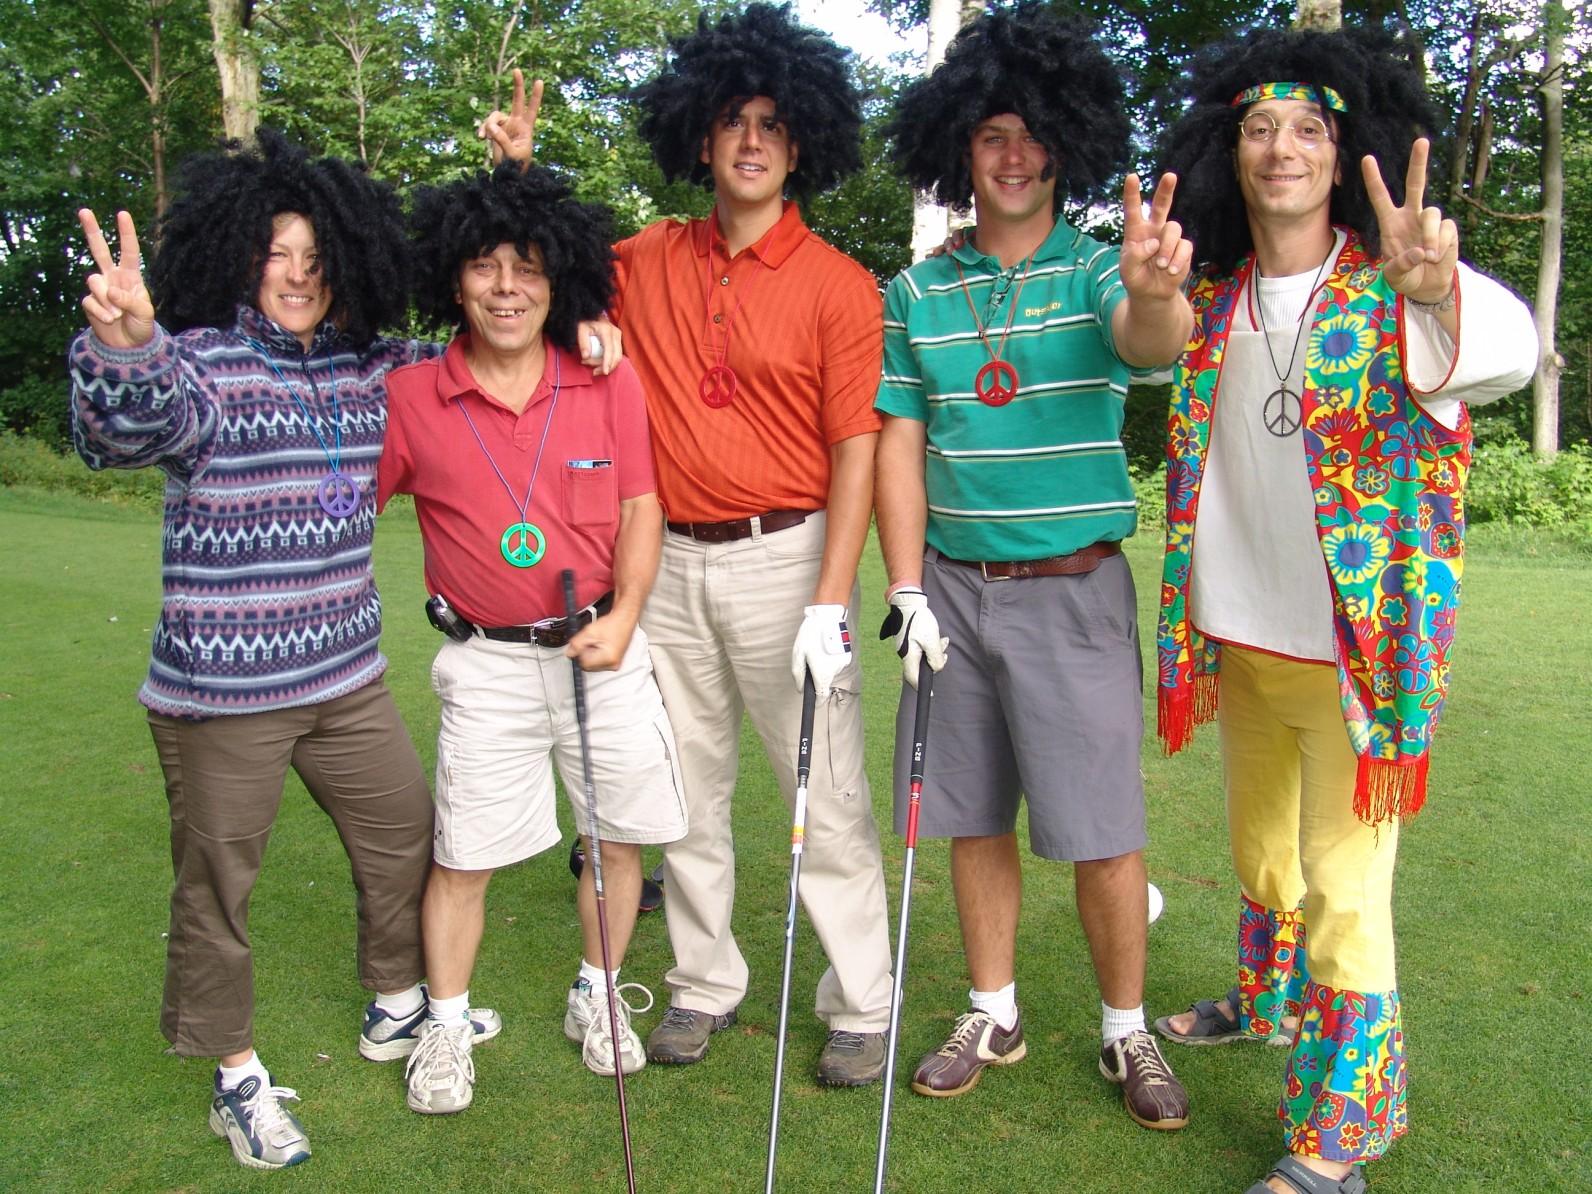 Golf-Peace-Fin-Banq-Nat-11-aout-2006-prodyaz.com-36-e1442971011370